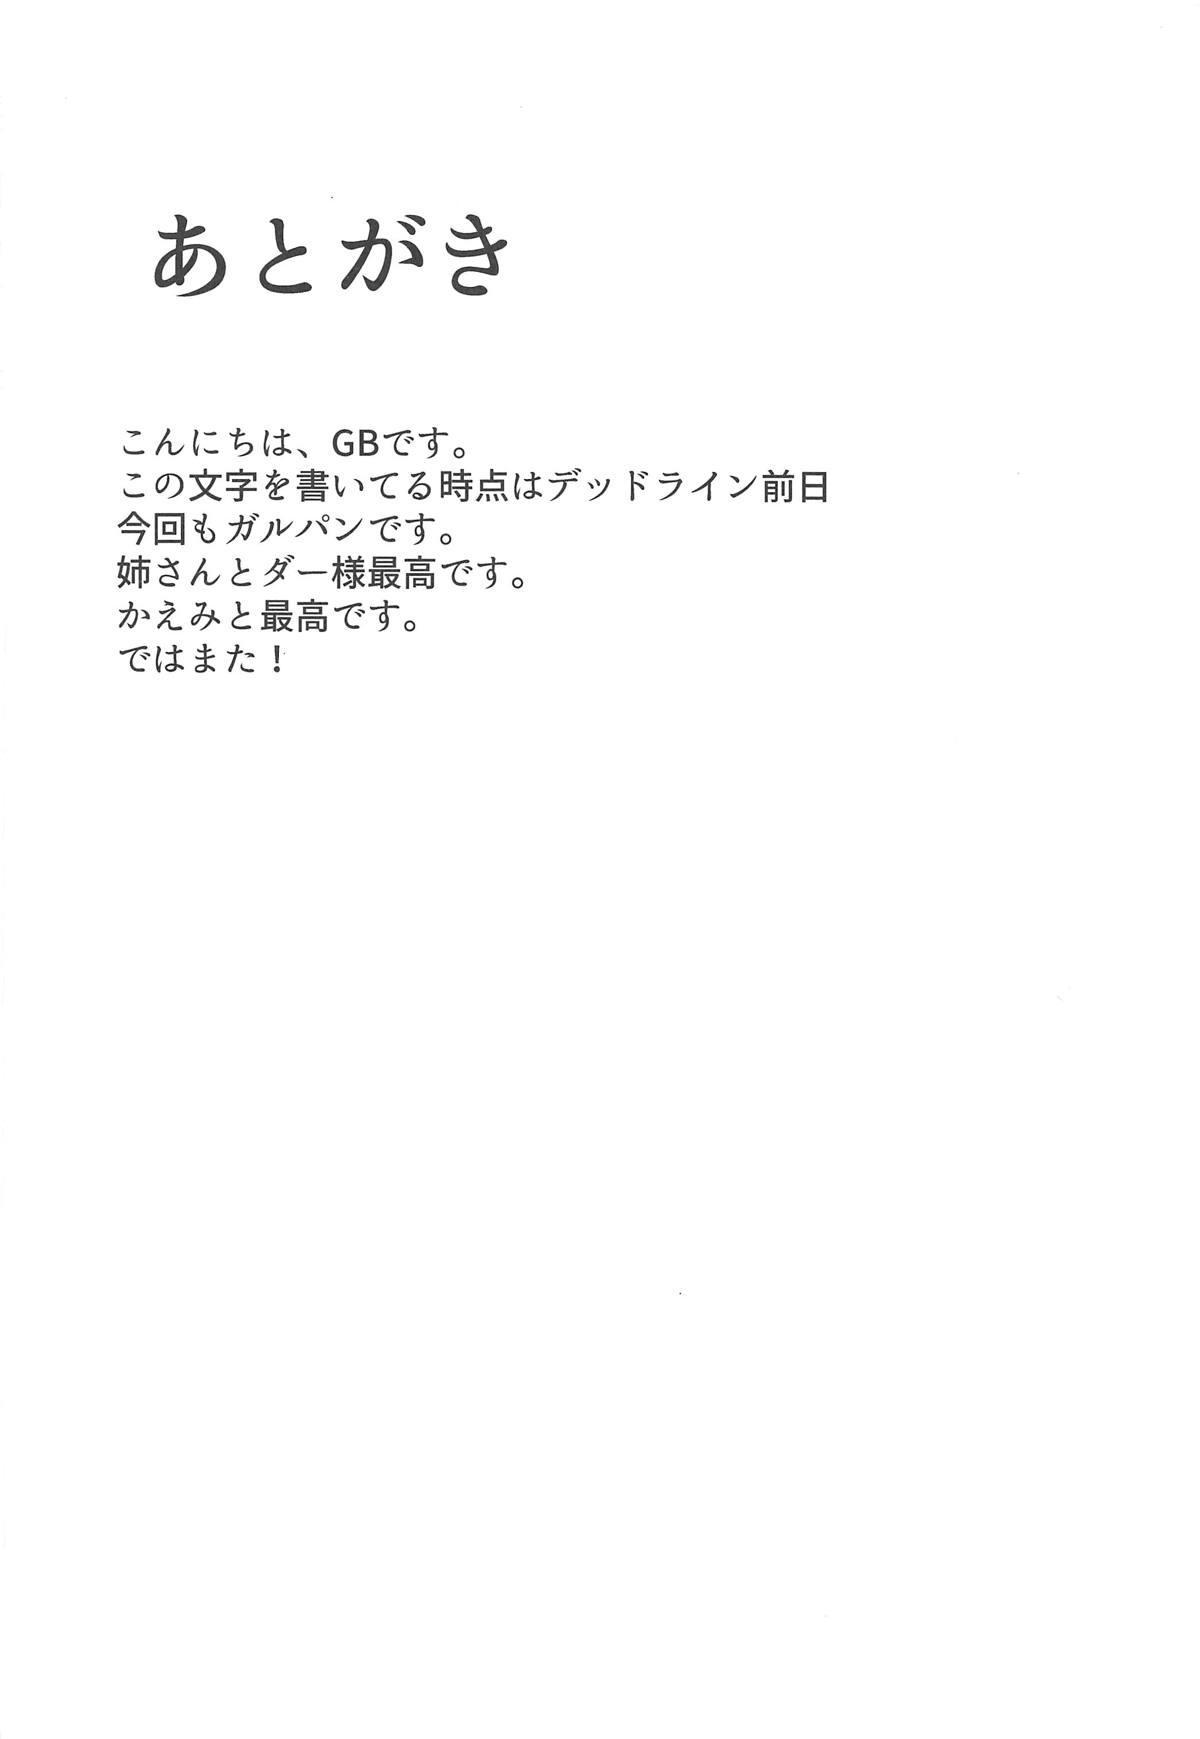 DarMaho → MahoDar 16